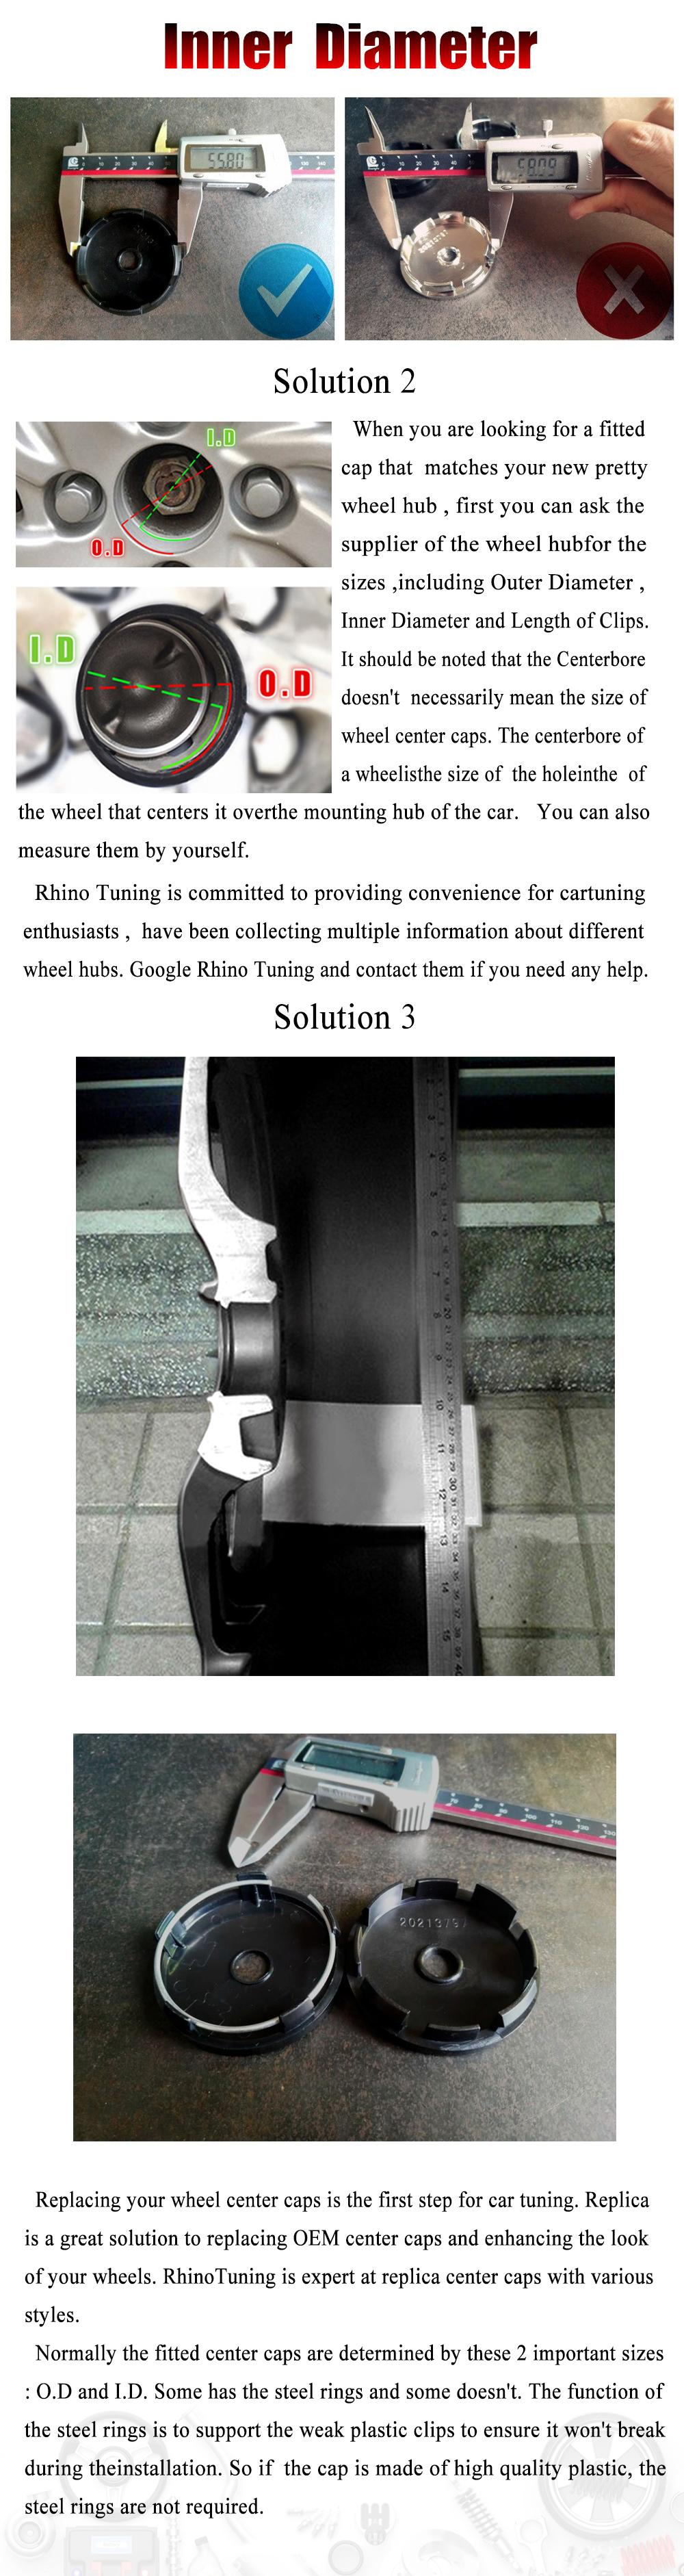 Car Door Protector Garage Wall Protector Rubber Self Adhesive Foam Strip 2*0.2M